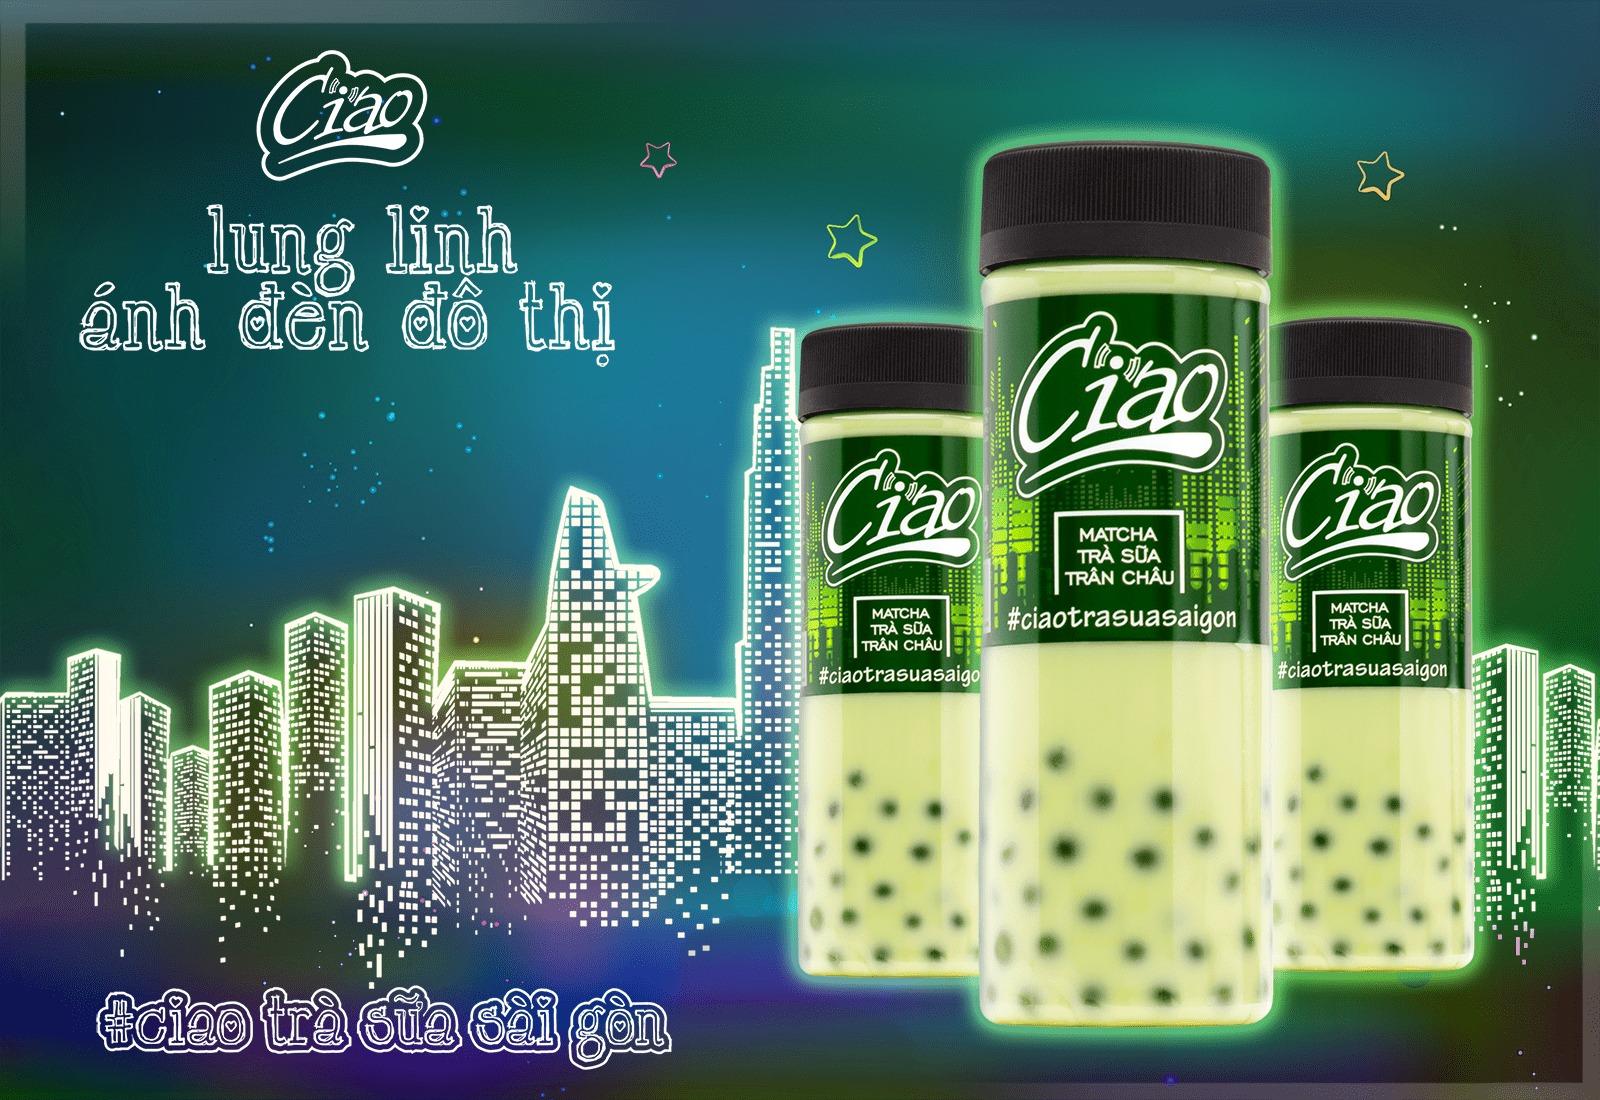 Trà Sữa Ciao - Ciao Trà Sữa Sài Gòn - 01